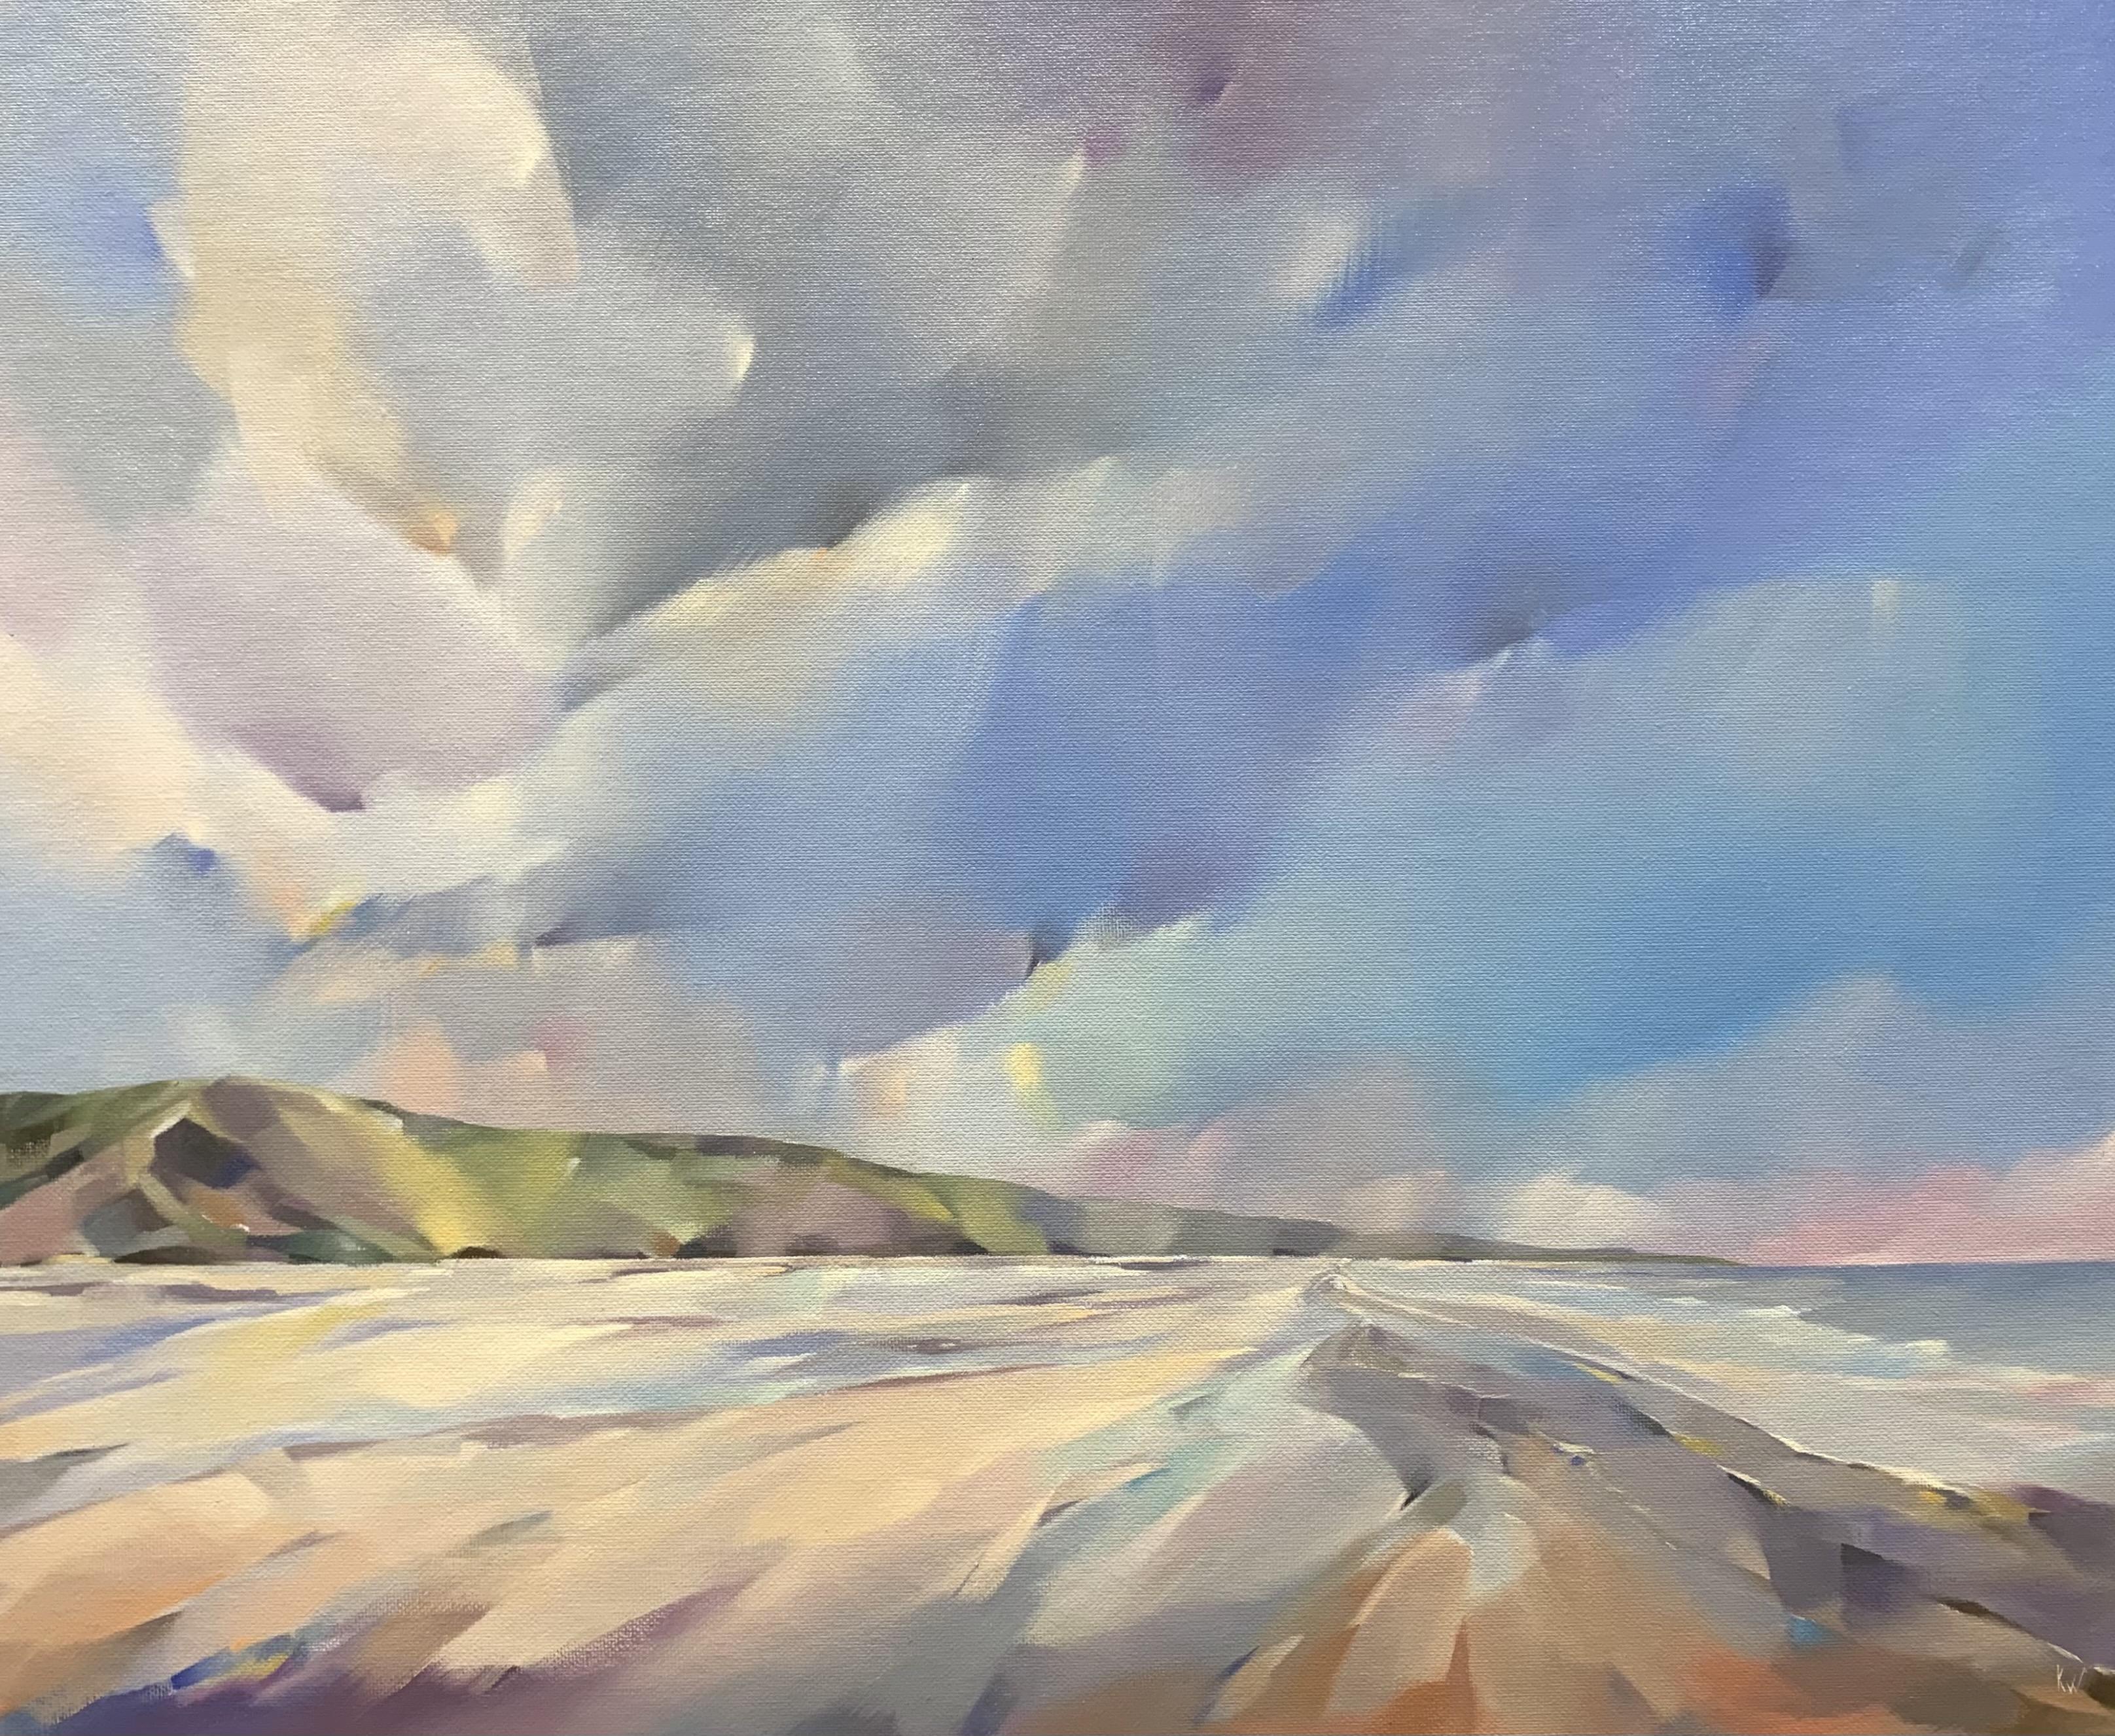 A Peaceful Saltburn by the Sea